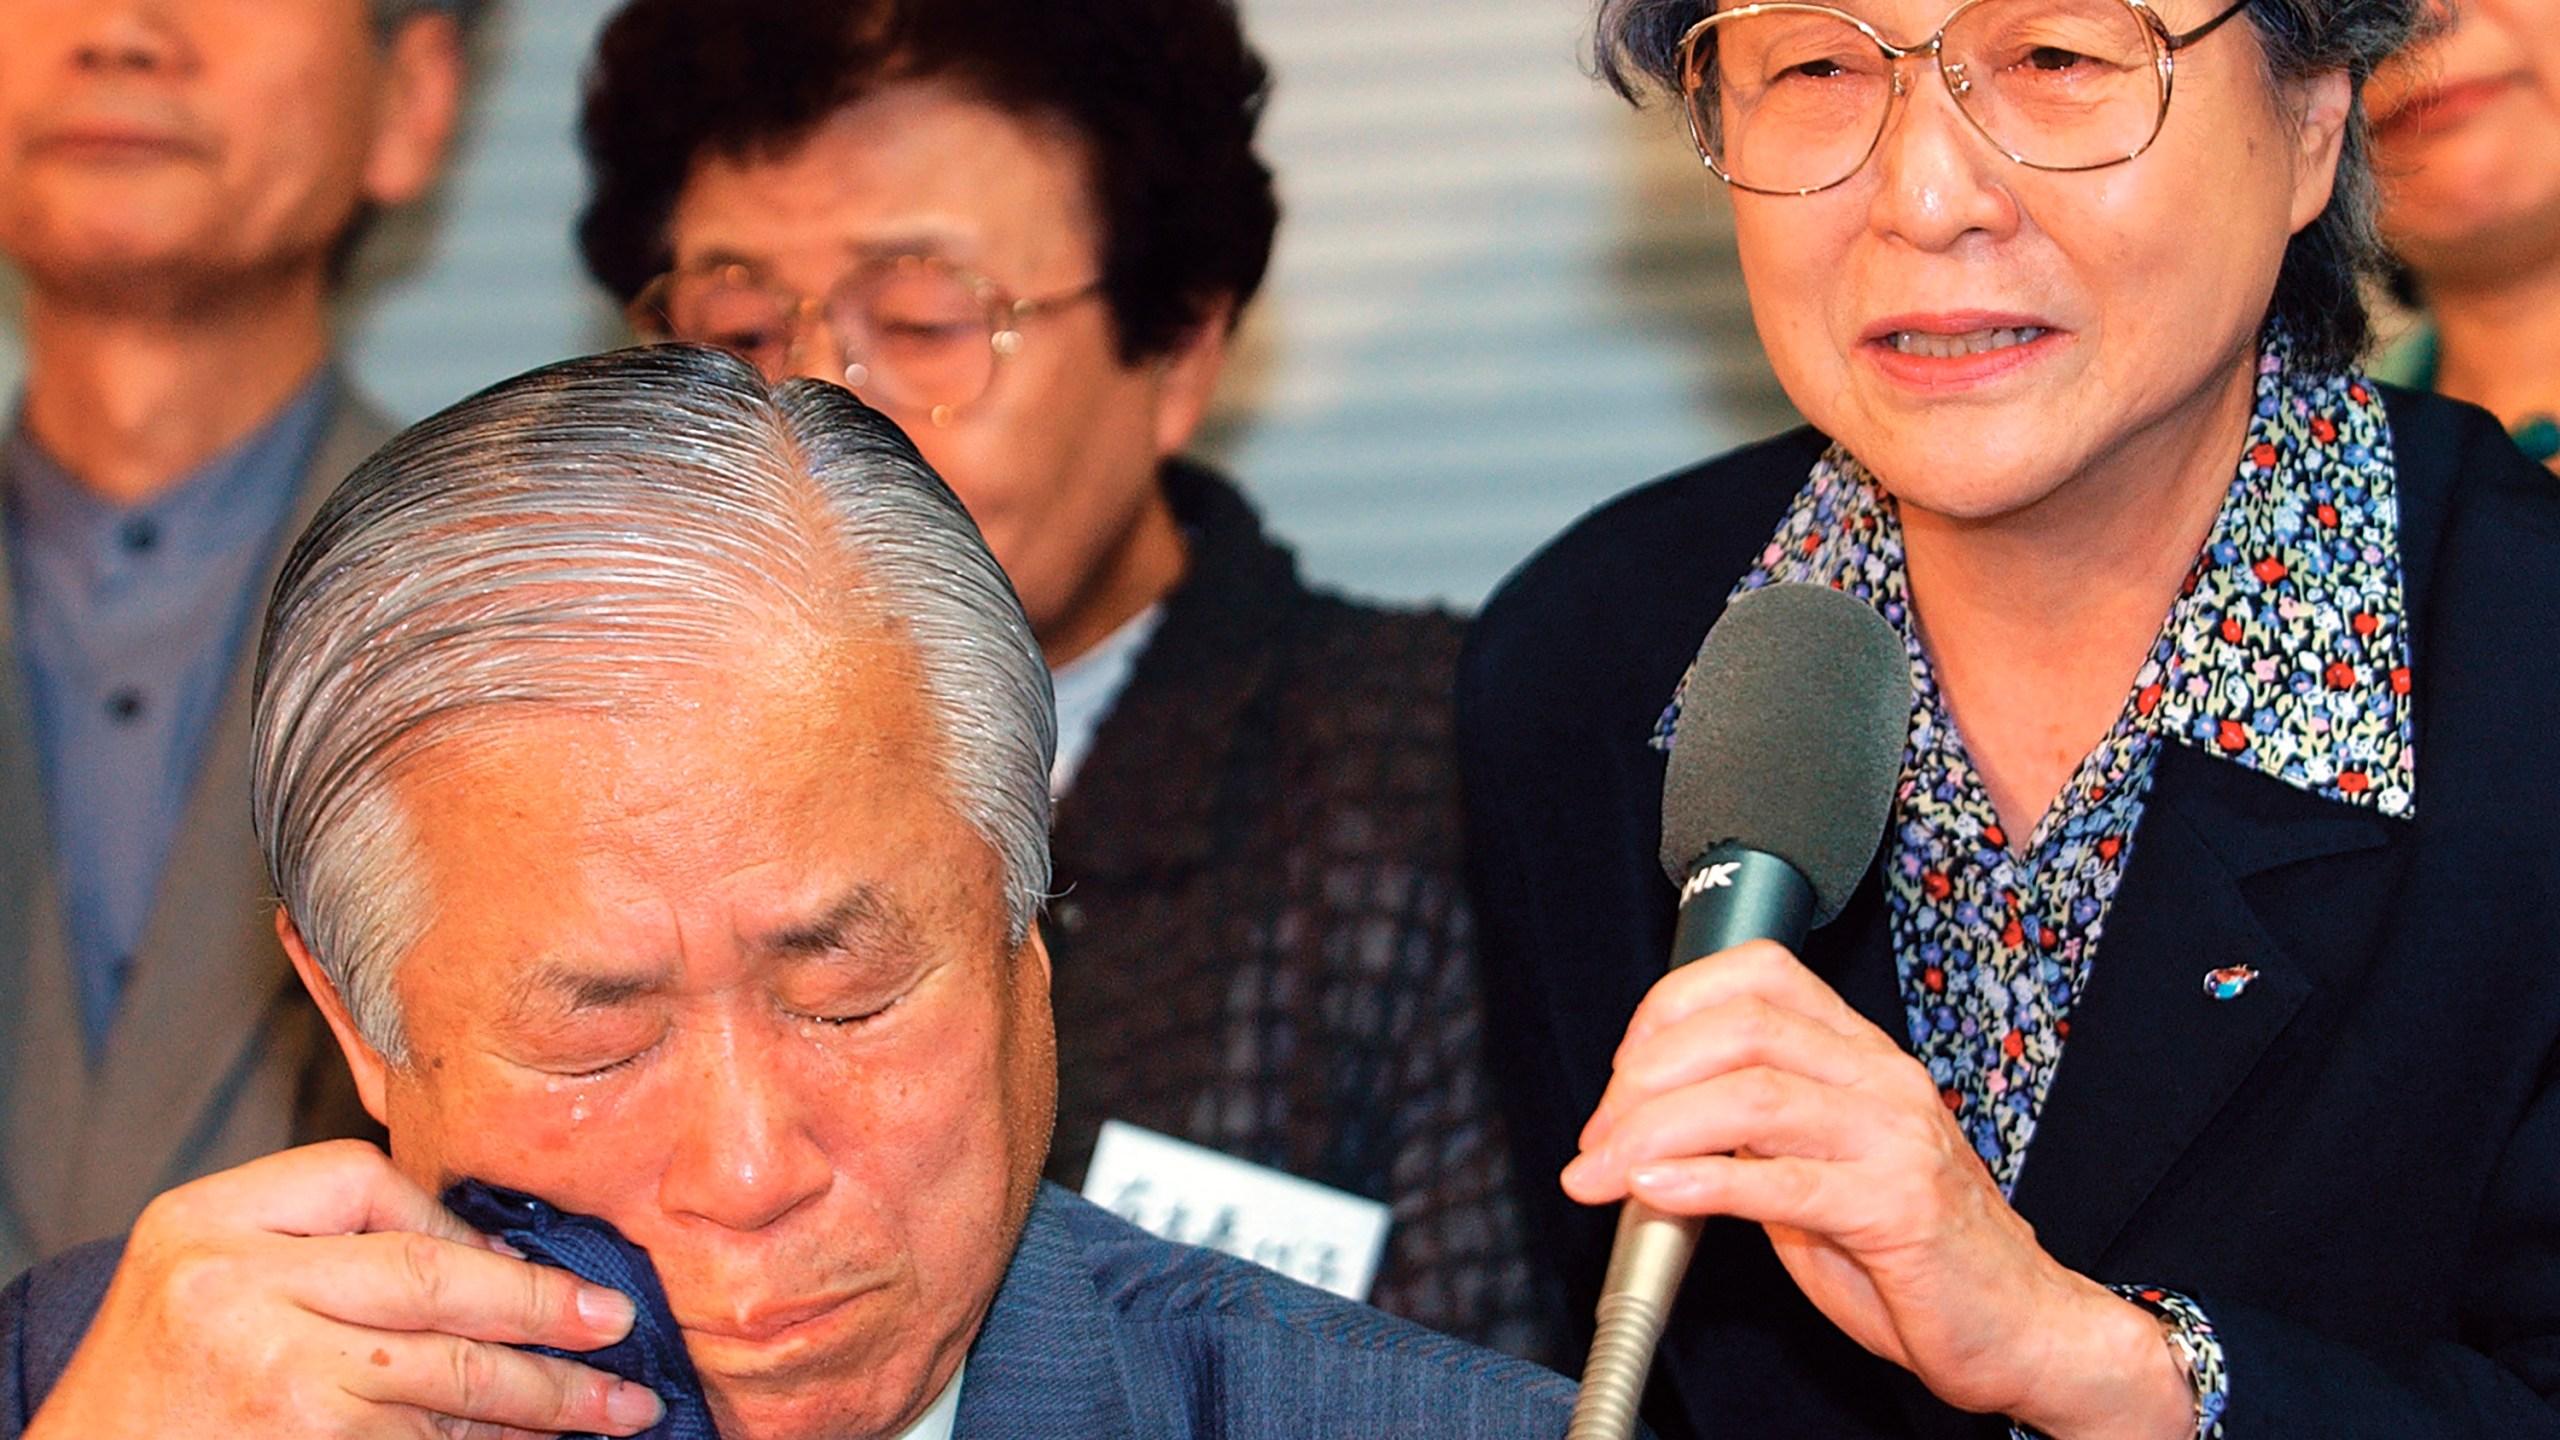 Shigeru Yokota